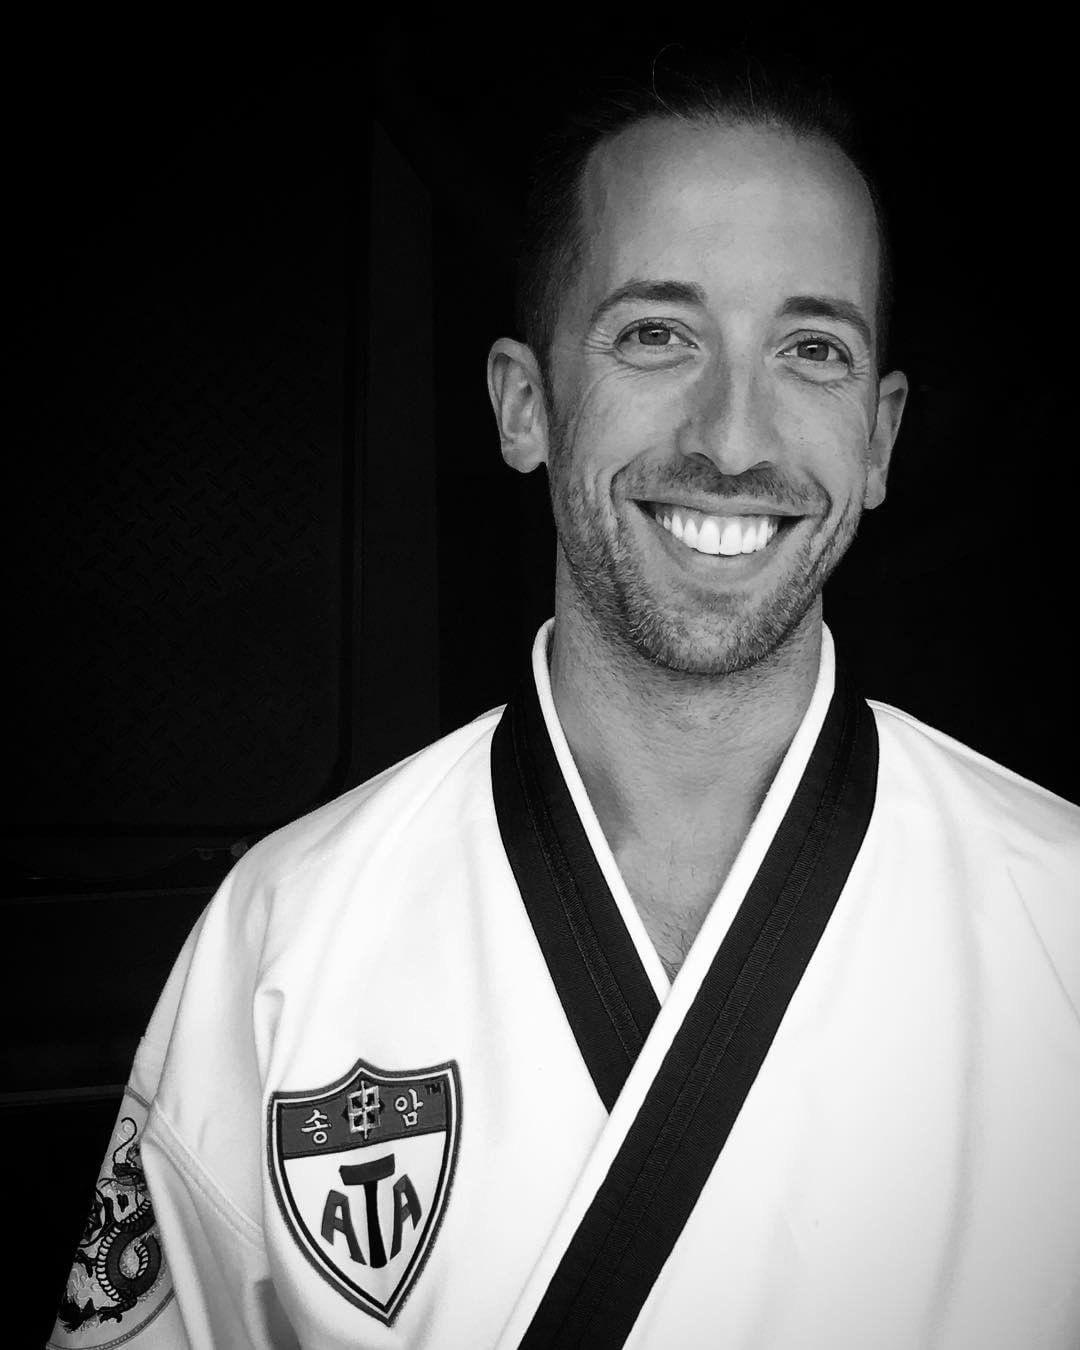 pursuit-instructor-blomquist.JPG